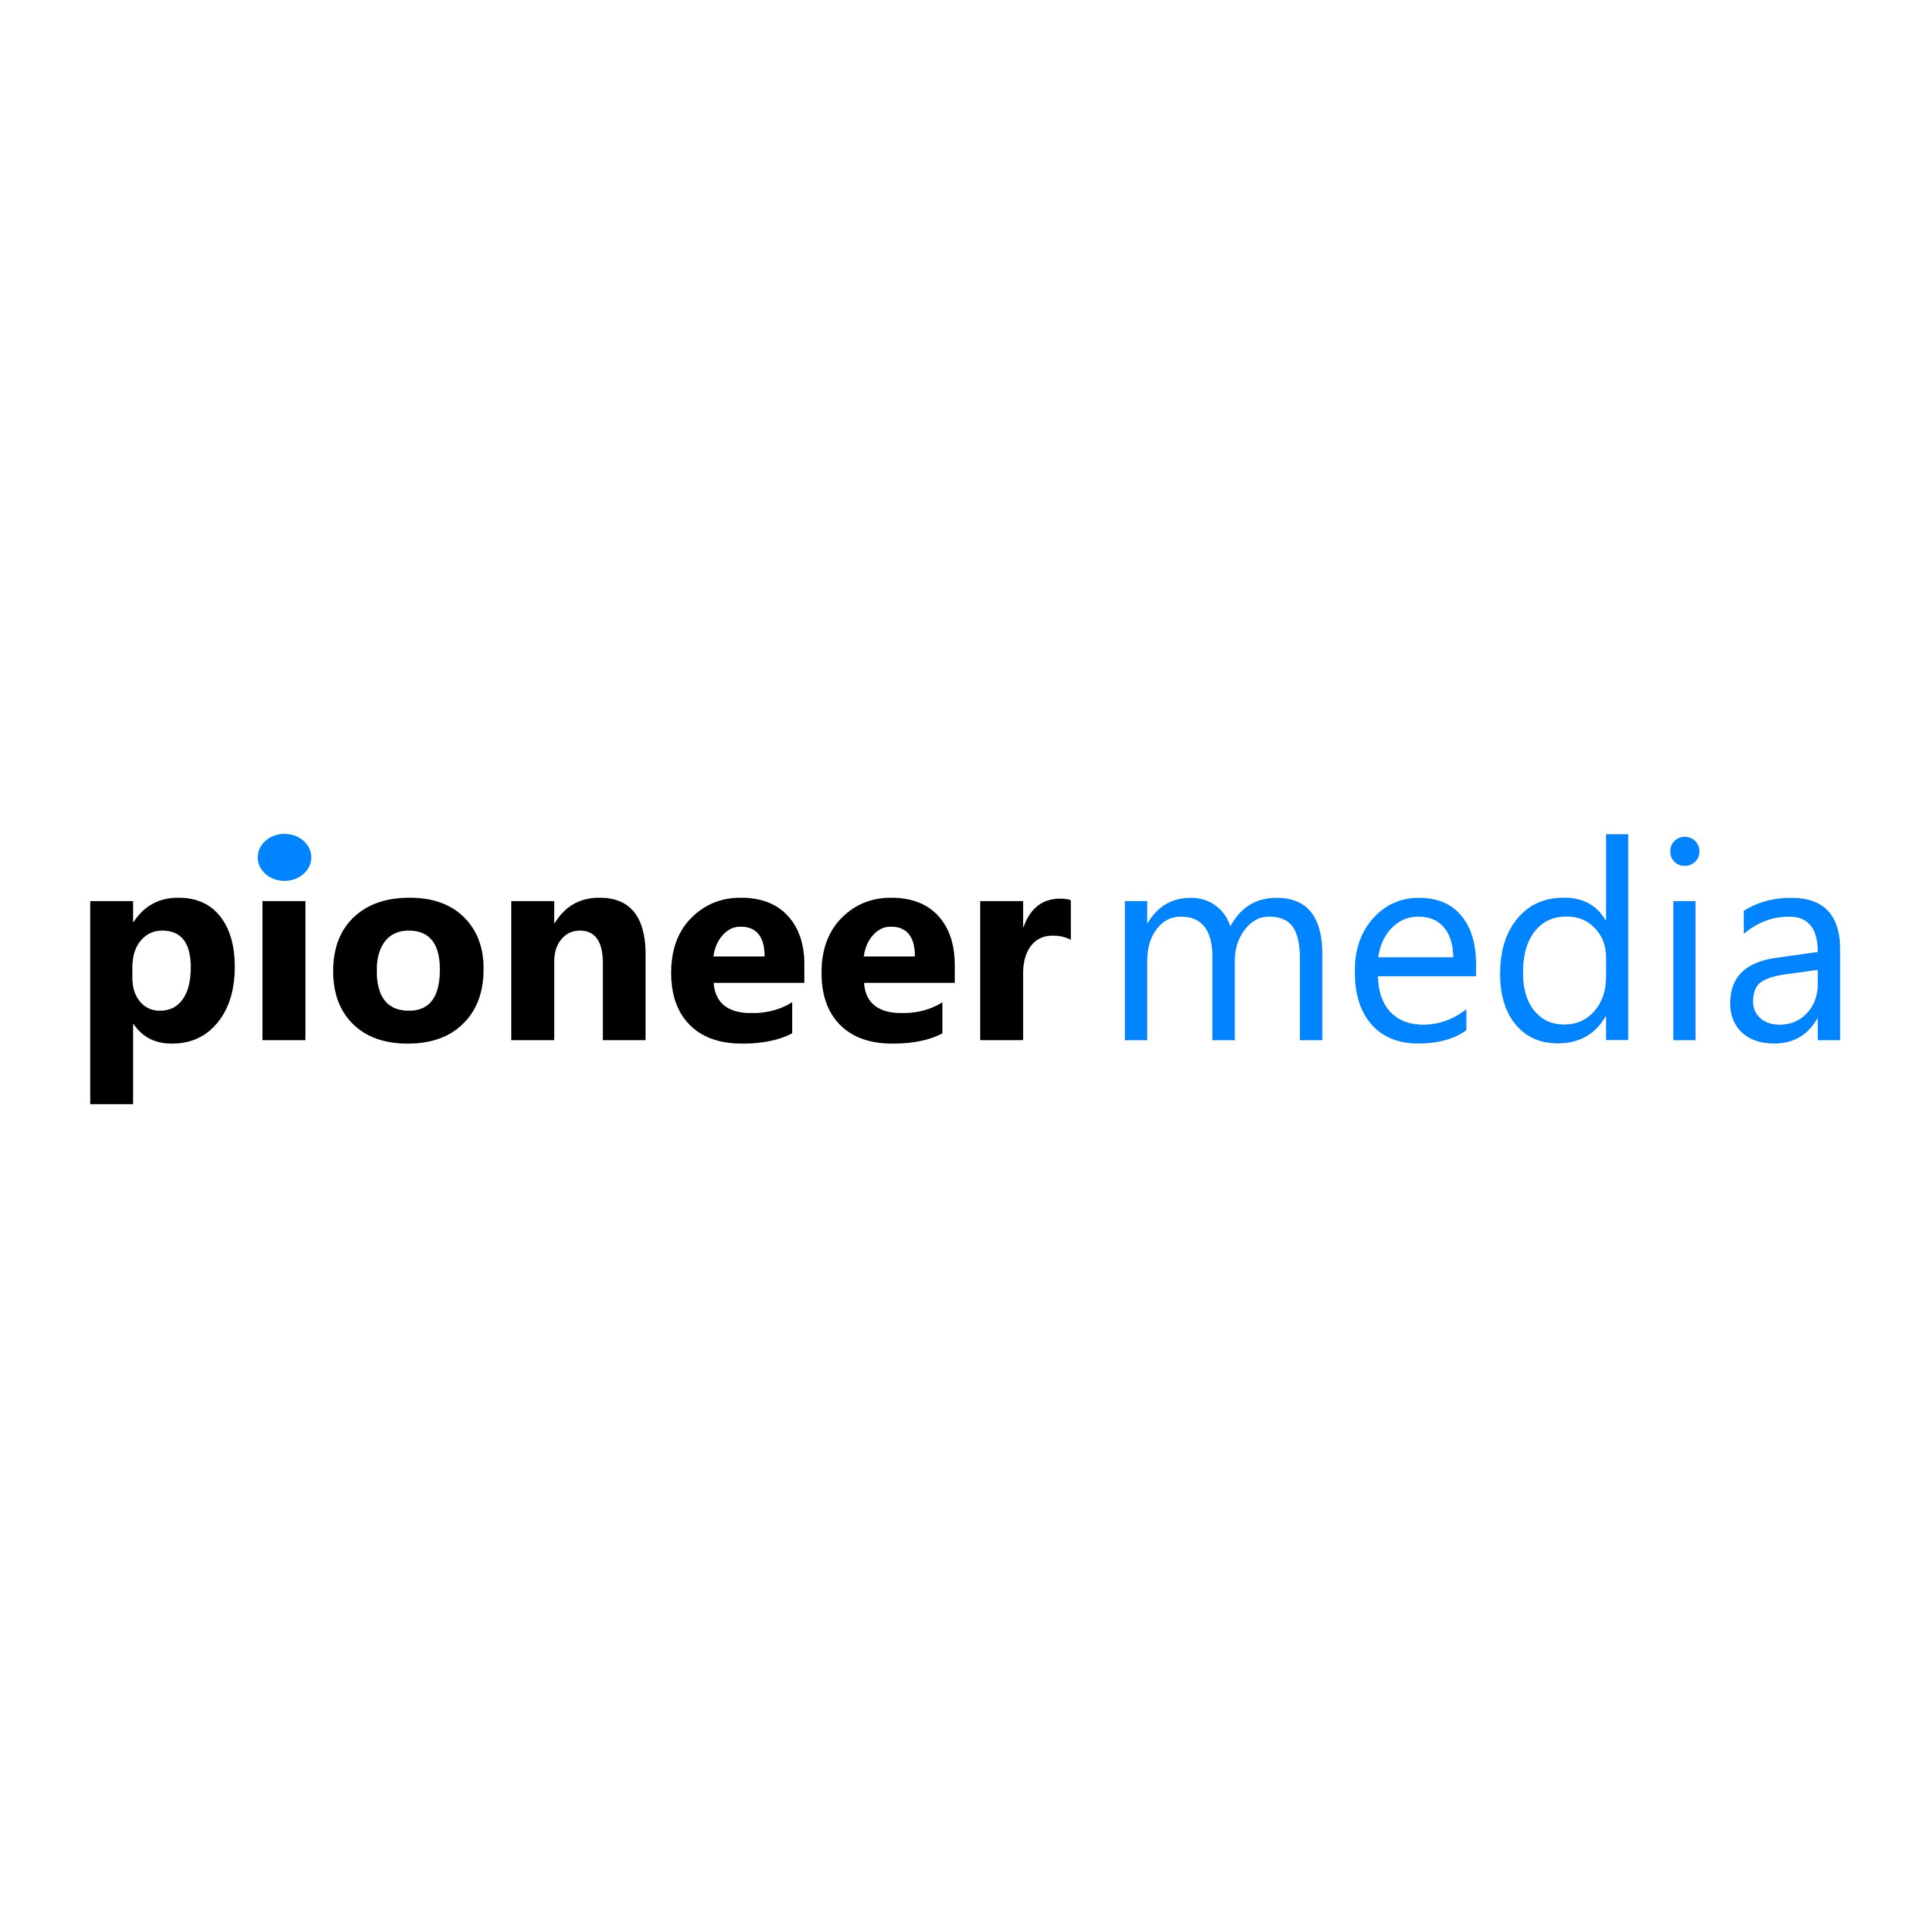 Web Design Pro is now Pioneer Media